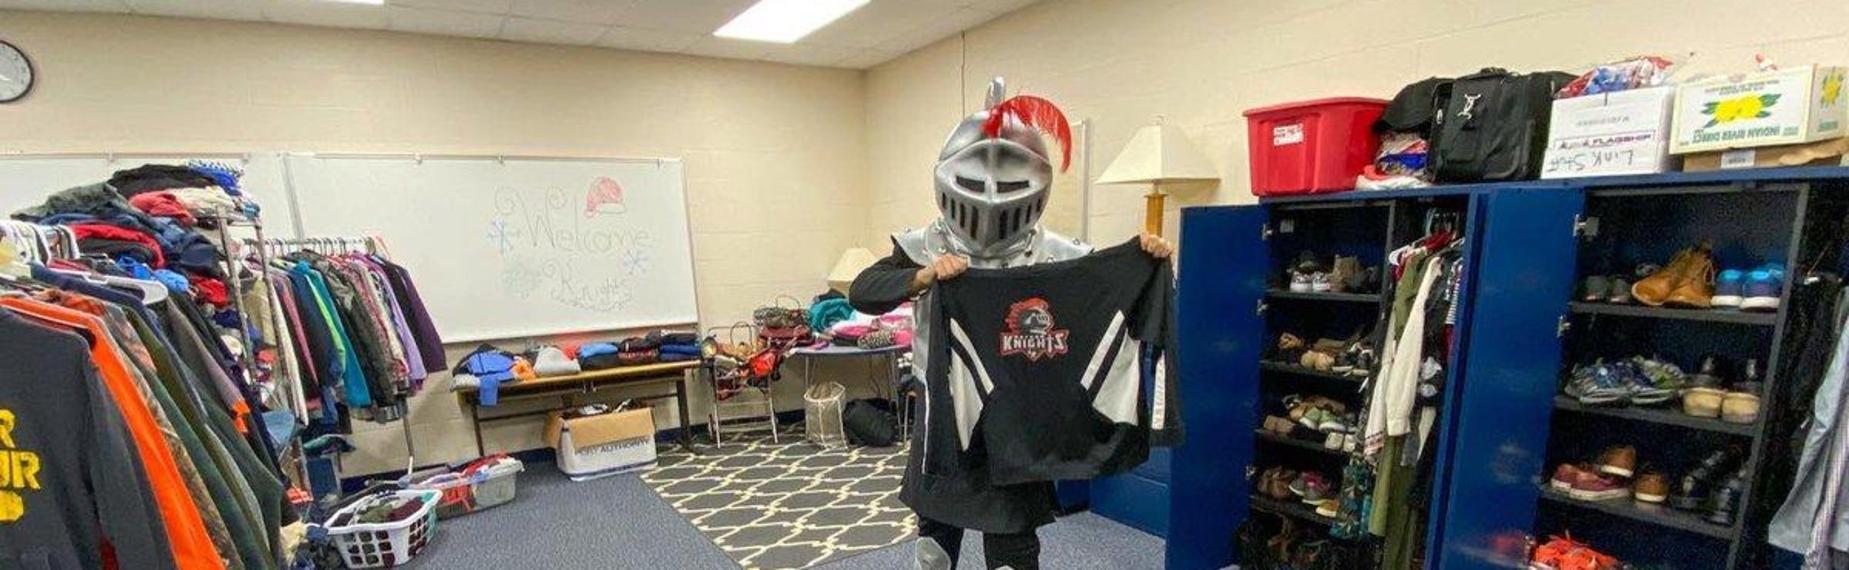 Knight Closet